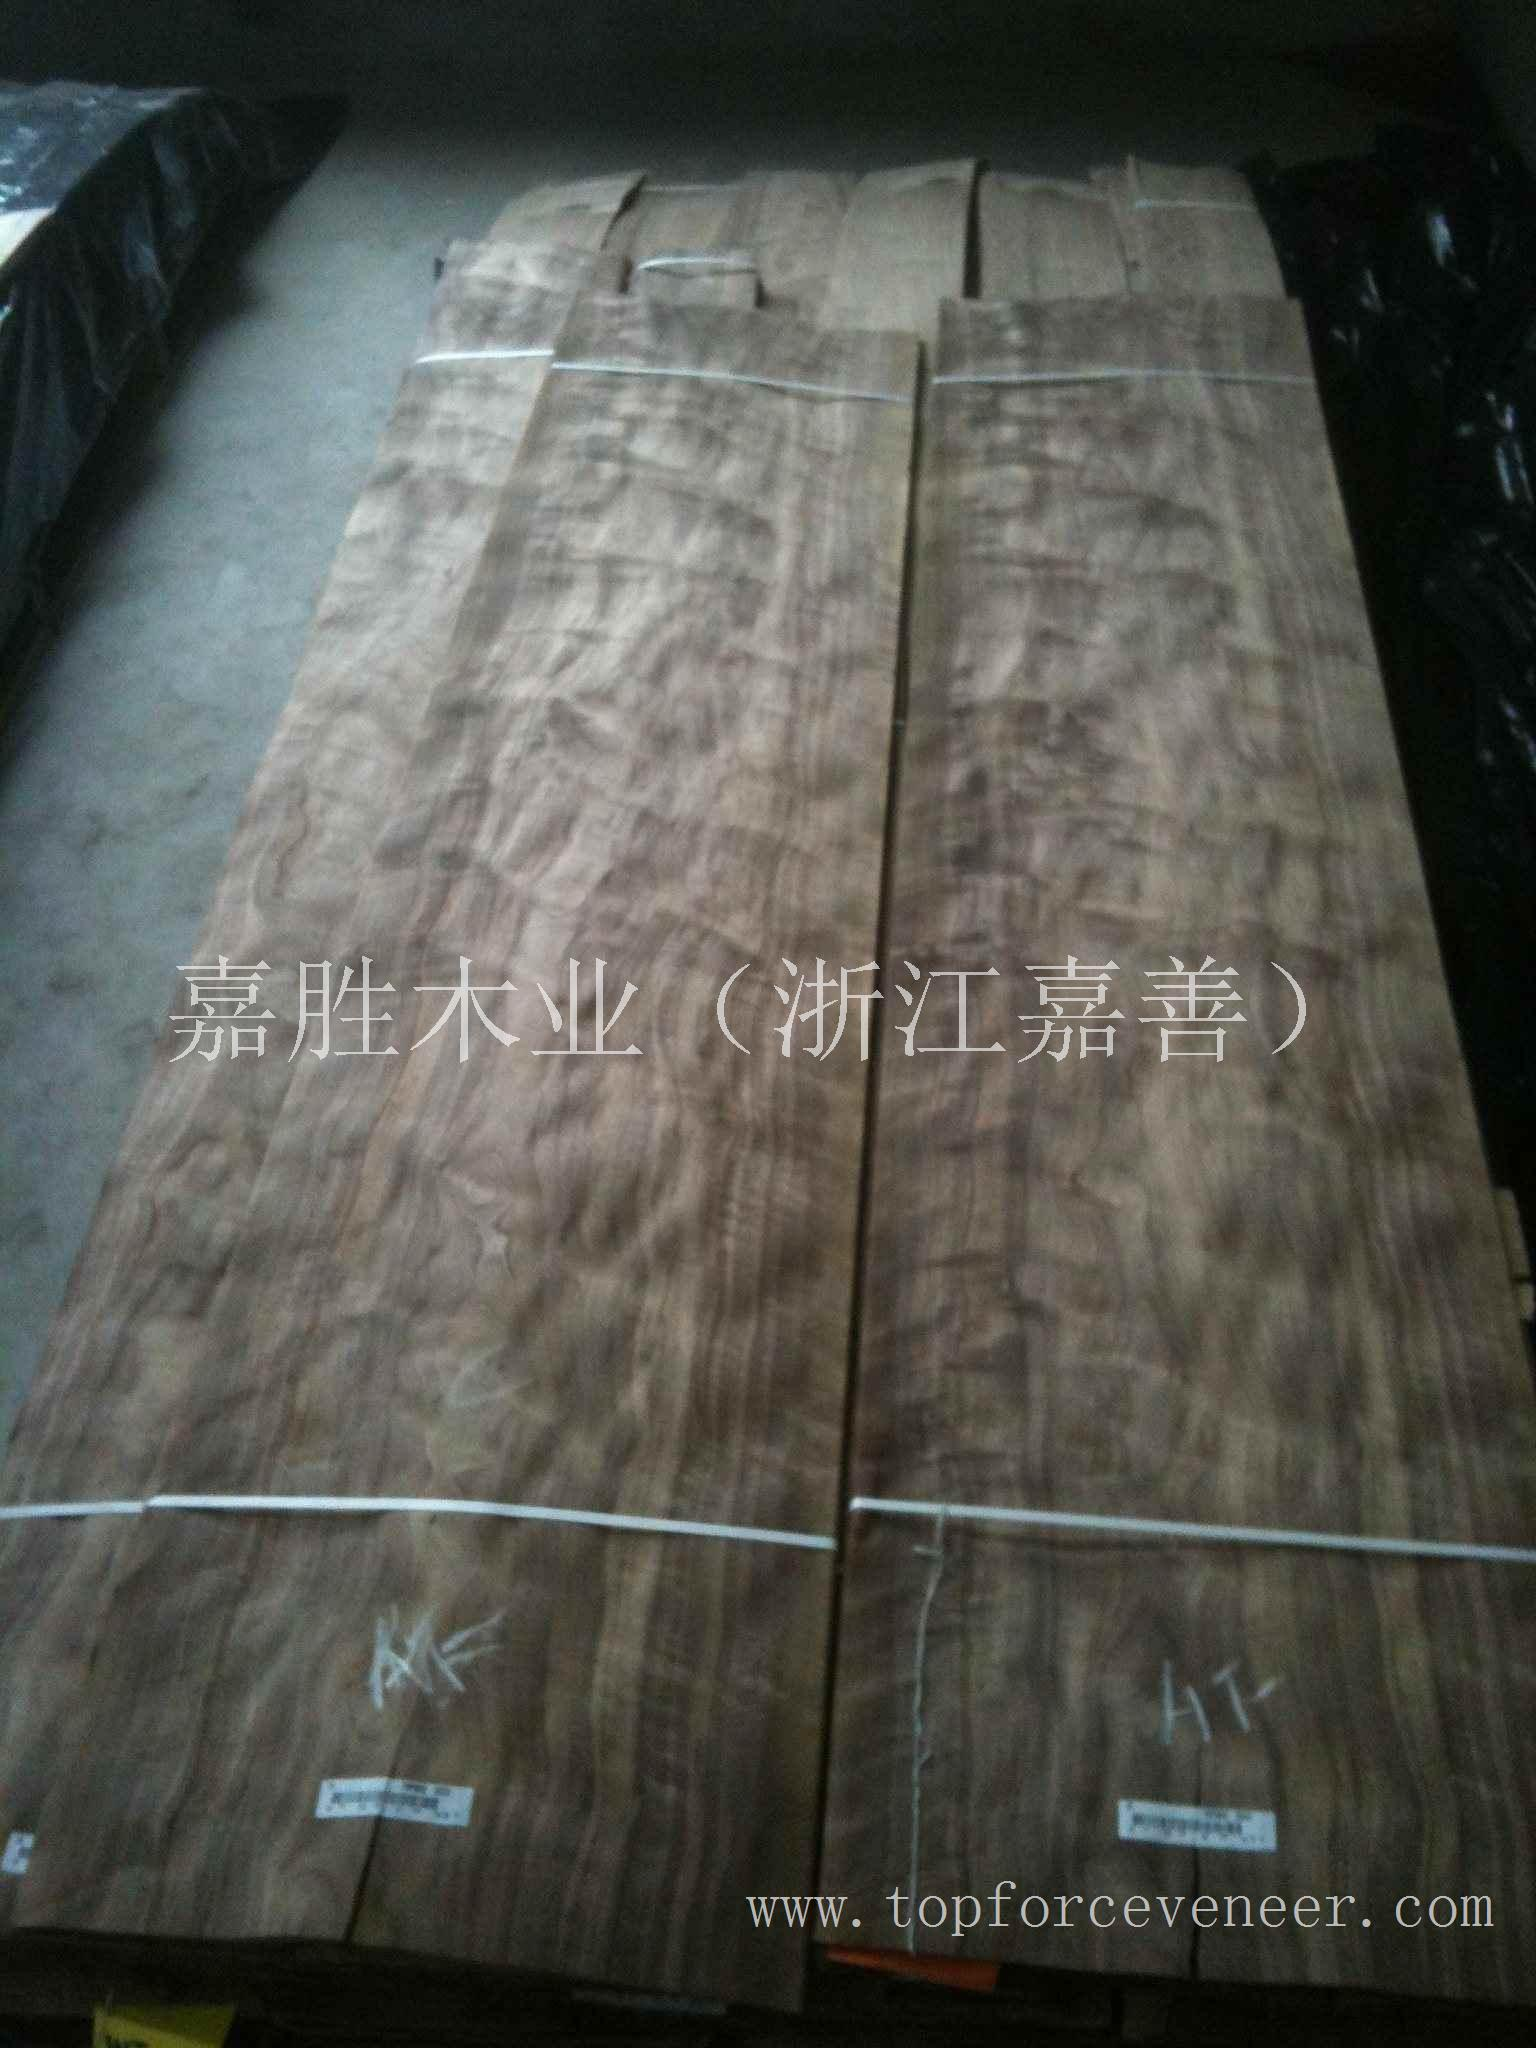 浙江黑胡桃强影家具级木皮 ZheJiang American Walnut Strong Figure Furniture Grade Veneer